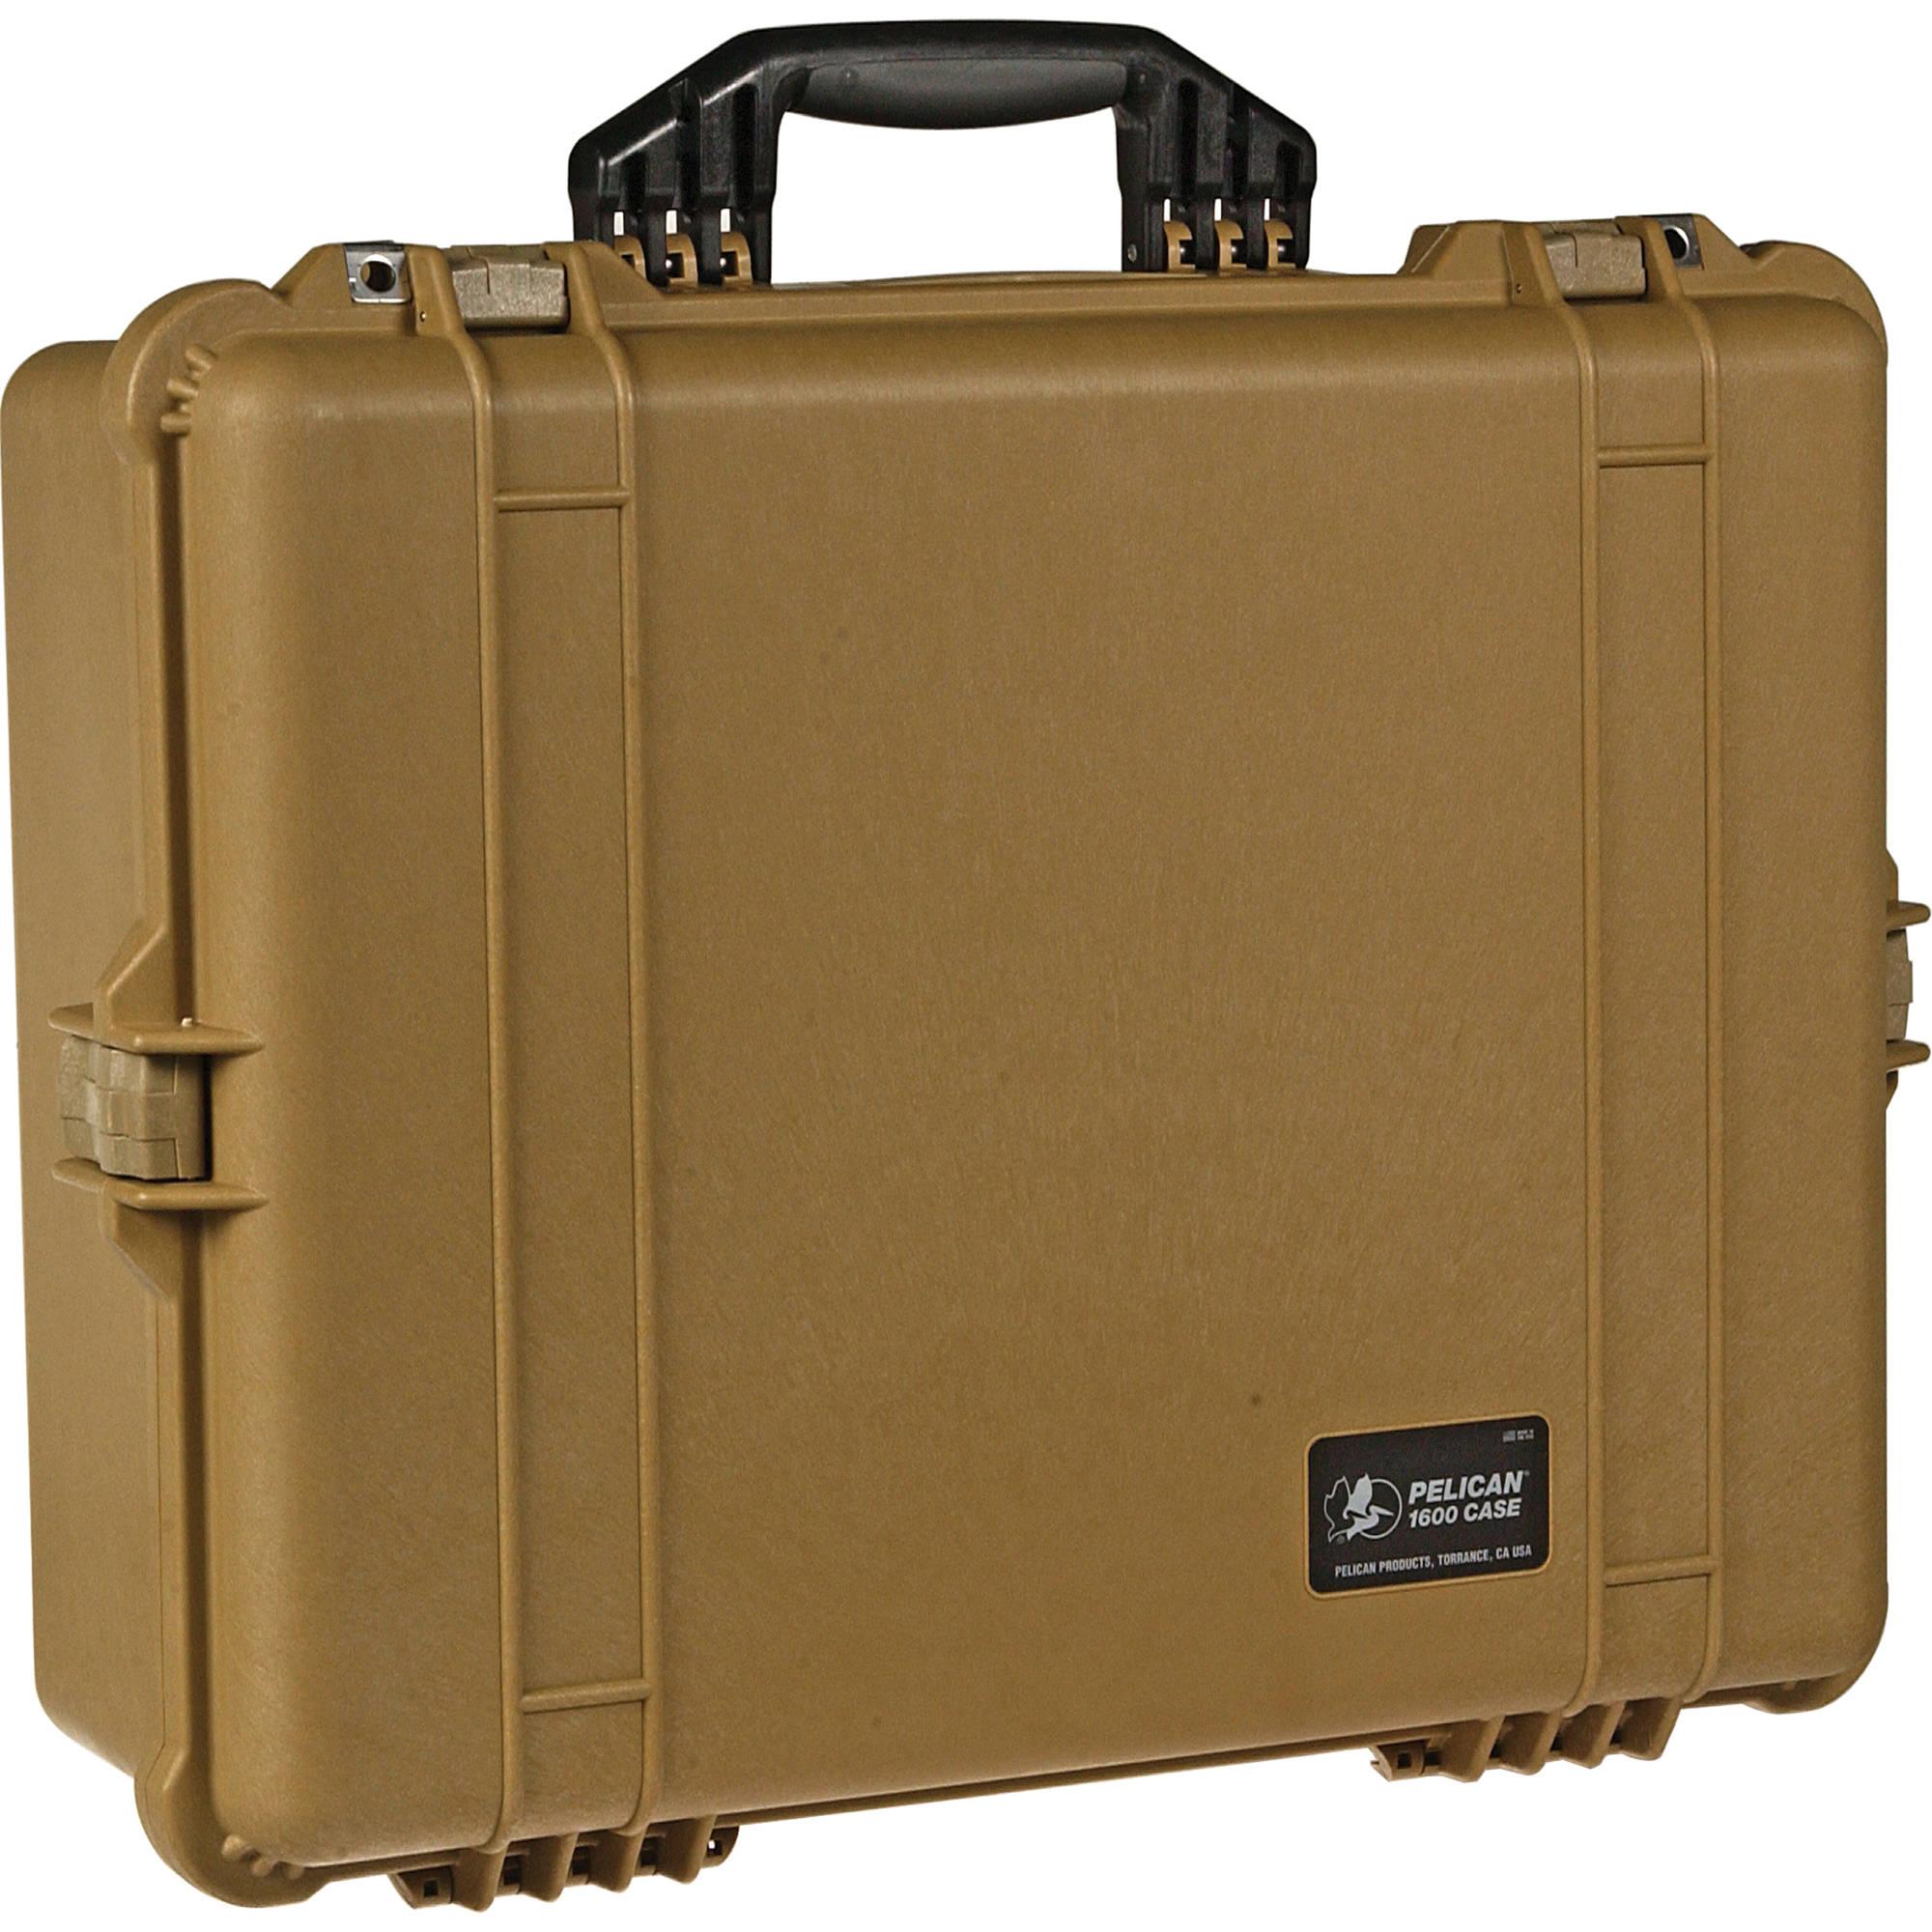 Pelican 1600 Case without Foam (Desert Tan) 1600-001-190 B&H